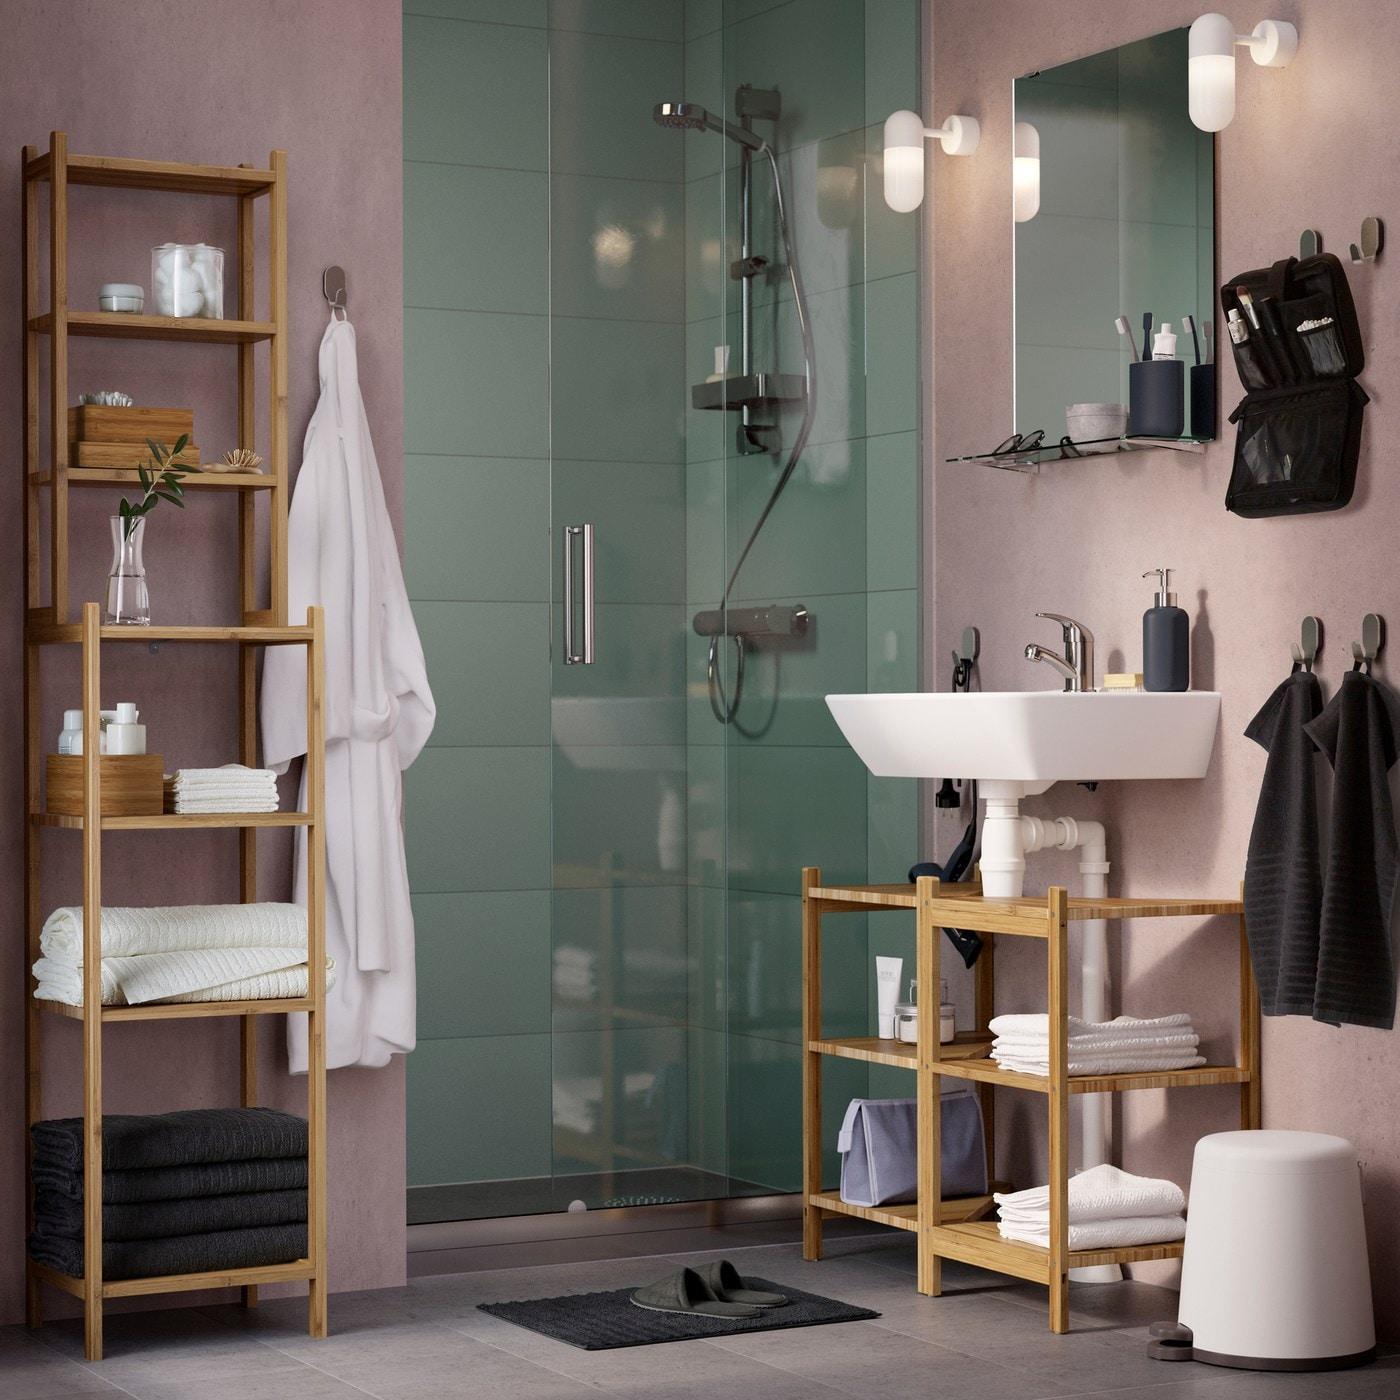 A beige and grey bathroom with RÅGRUND wash basin/corner shelf and shelving unit in bamboo.